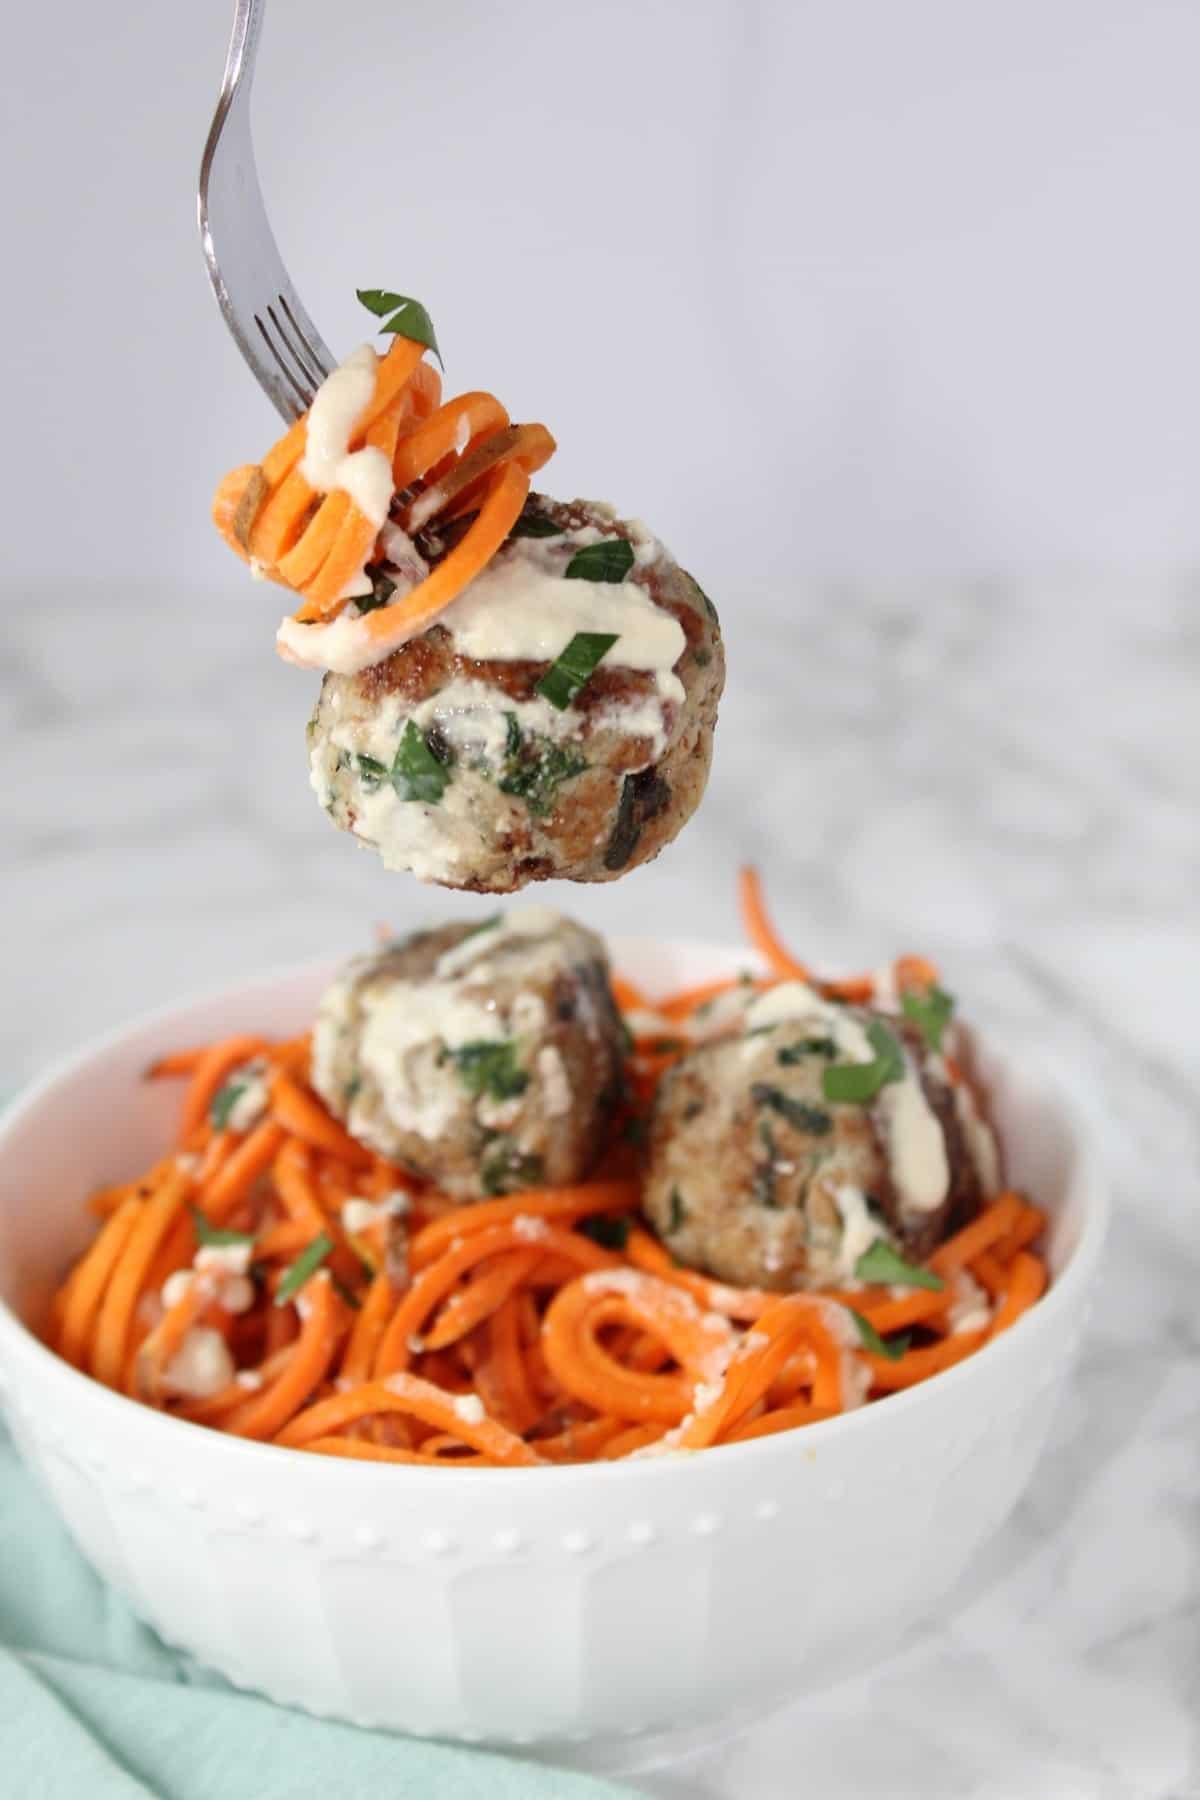 Spinach & Artichoke Chicken Meatballs